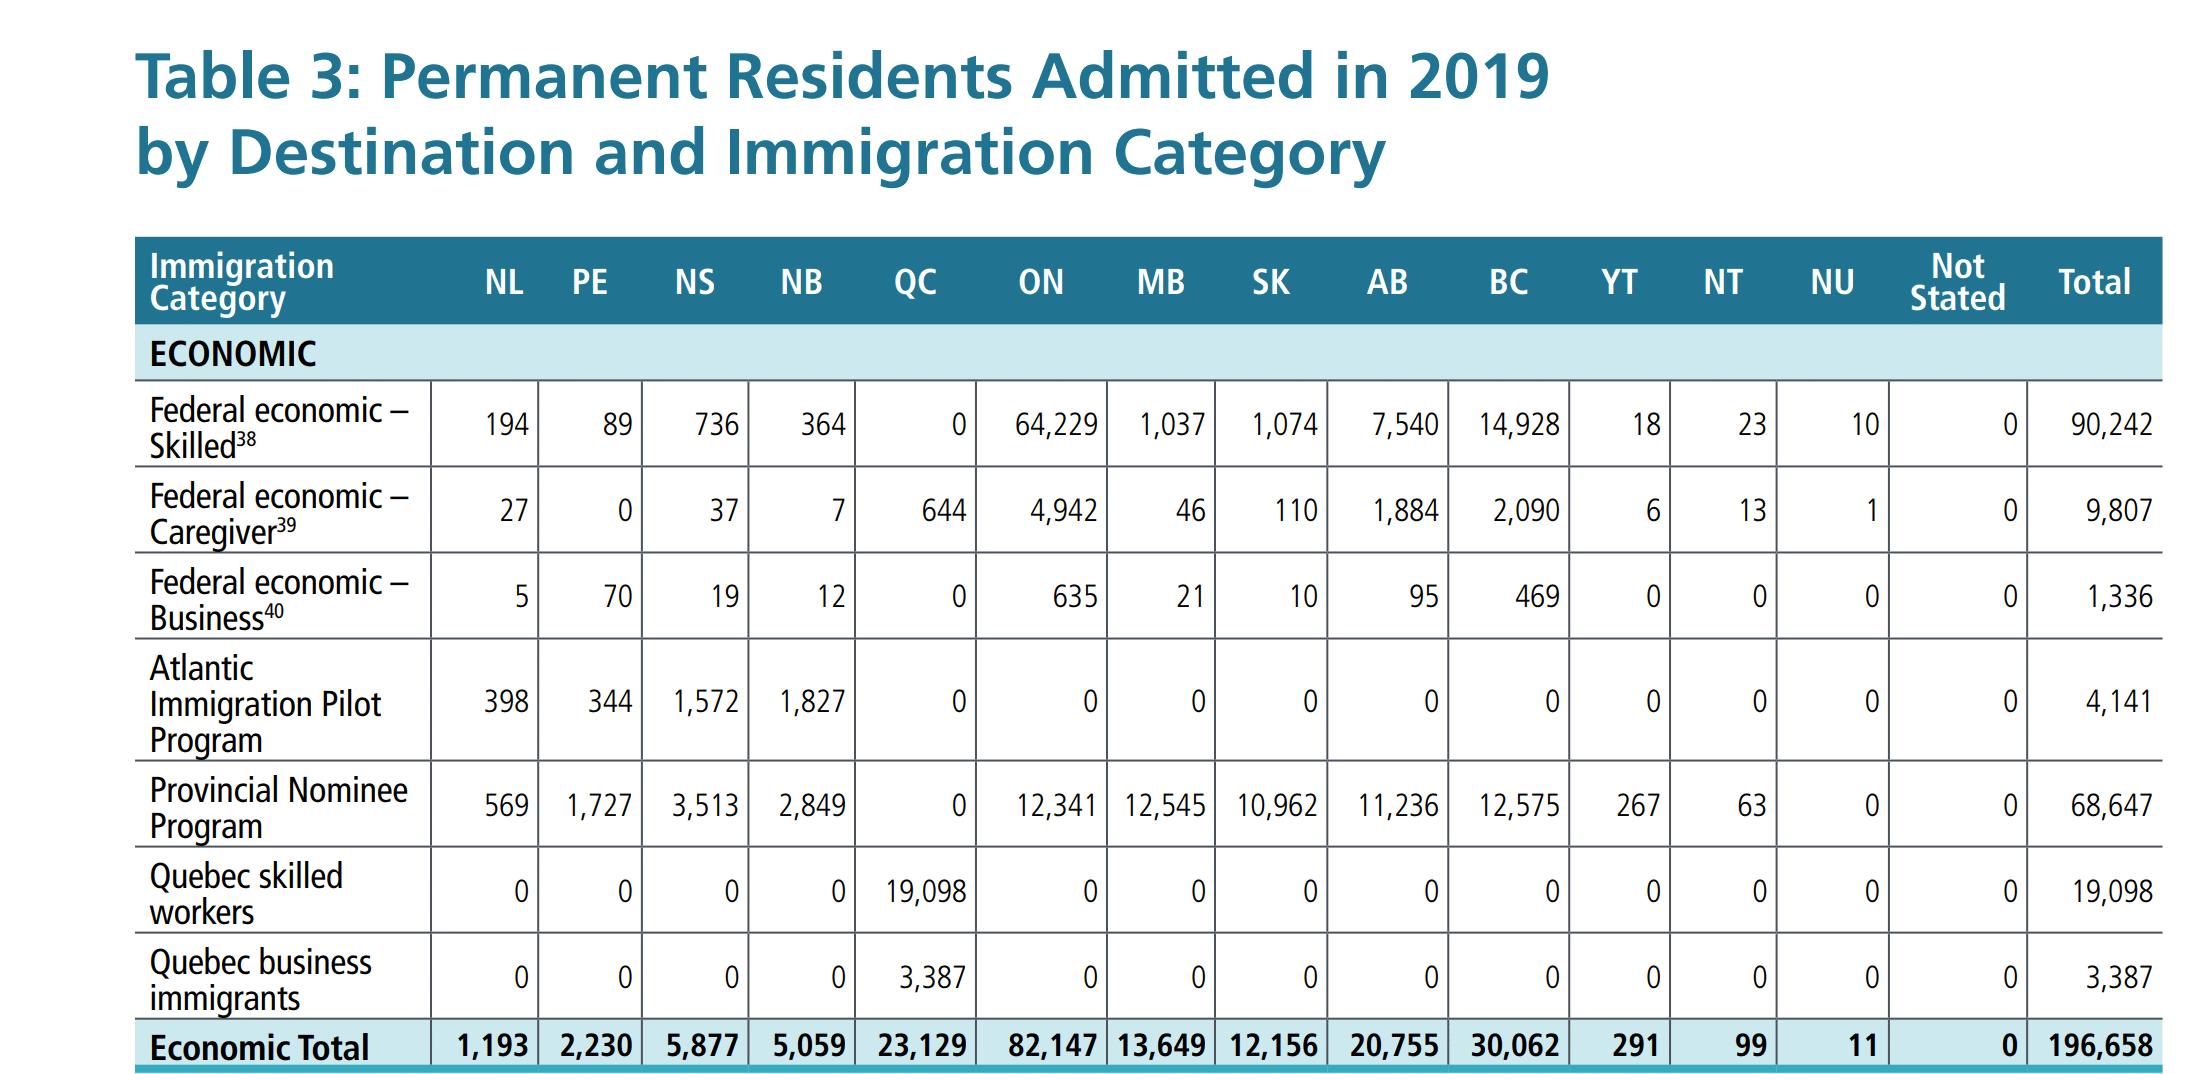 Economic class arrivals under Annual immigration report IRCC 2019